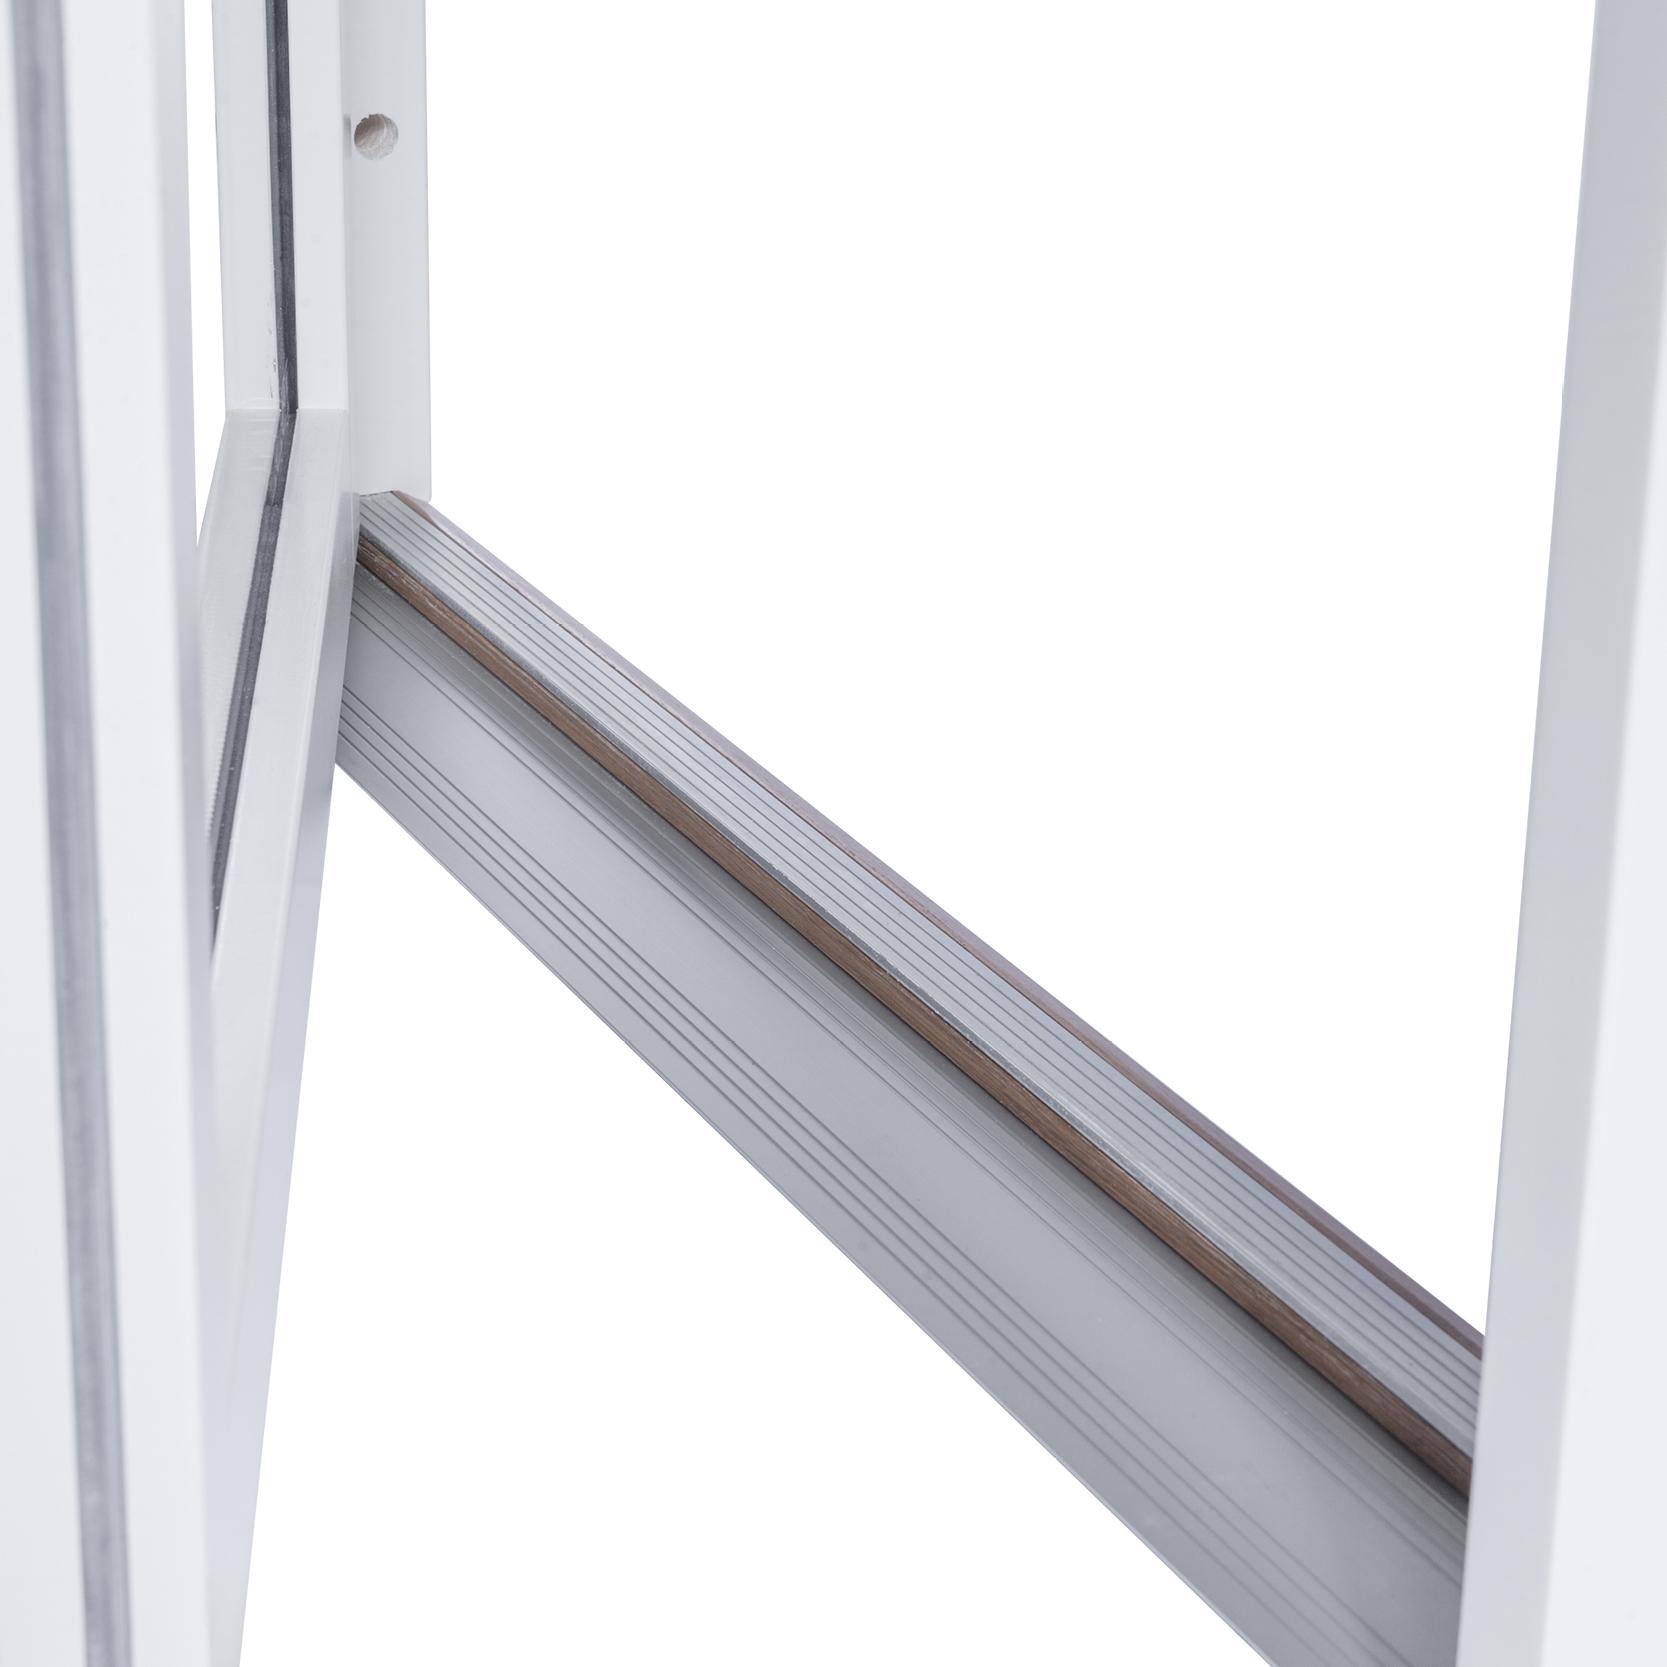 Enkel Altan/Balkongdörr – Trä/Alu – Flex Fönster